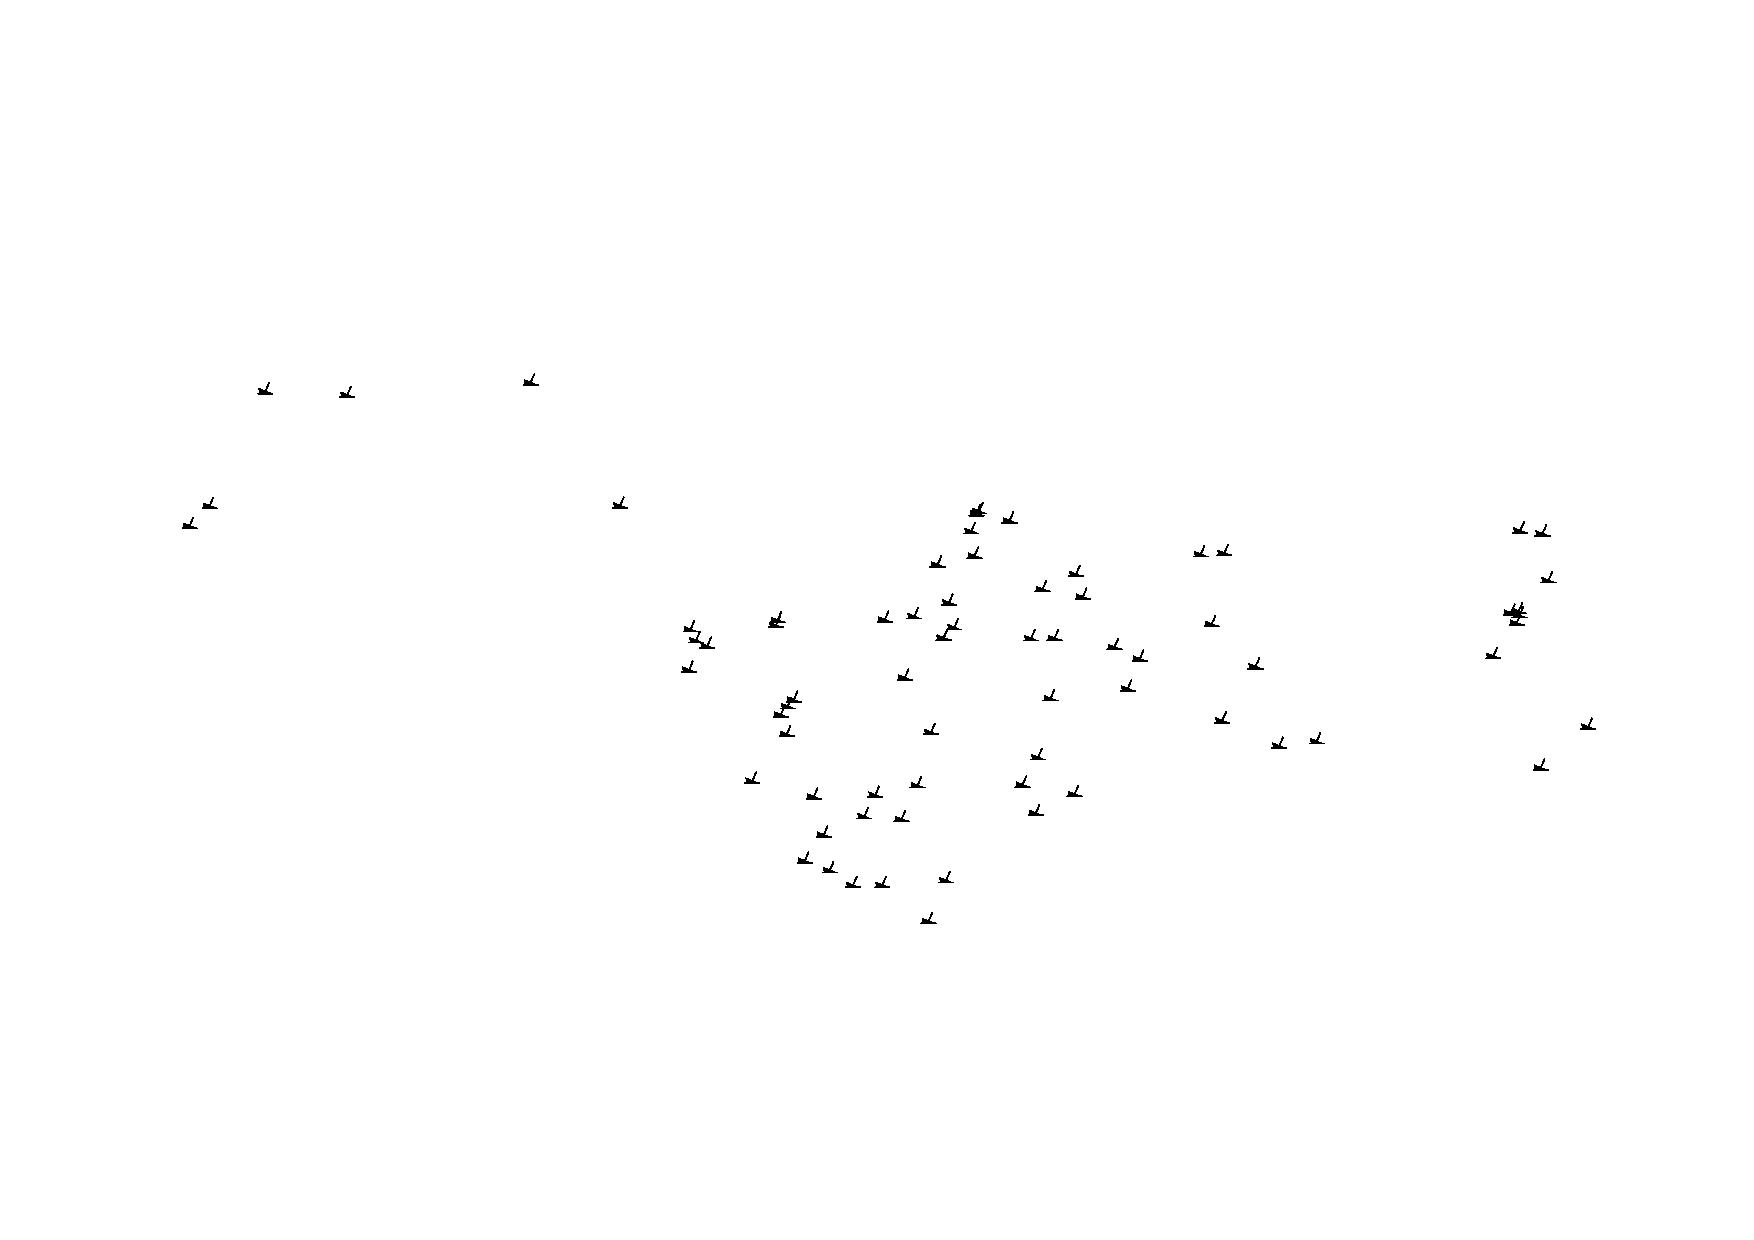 dredged area